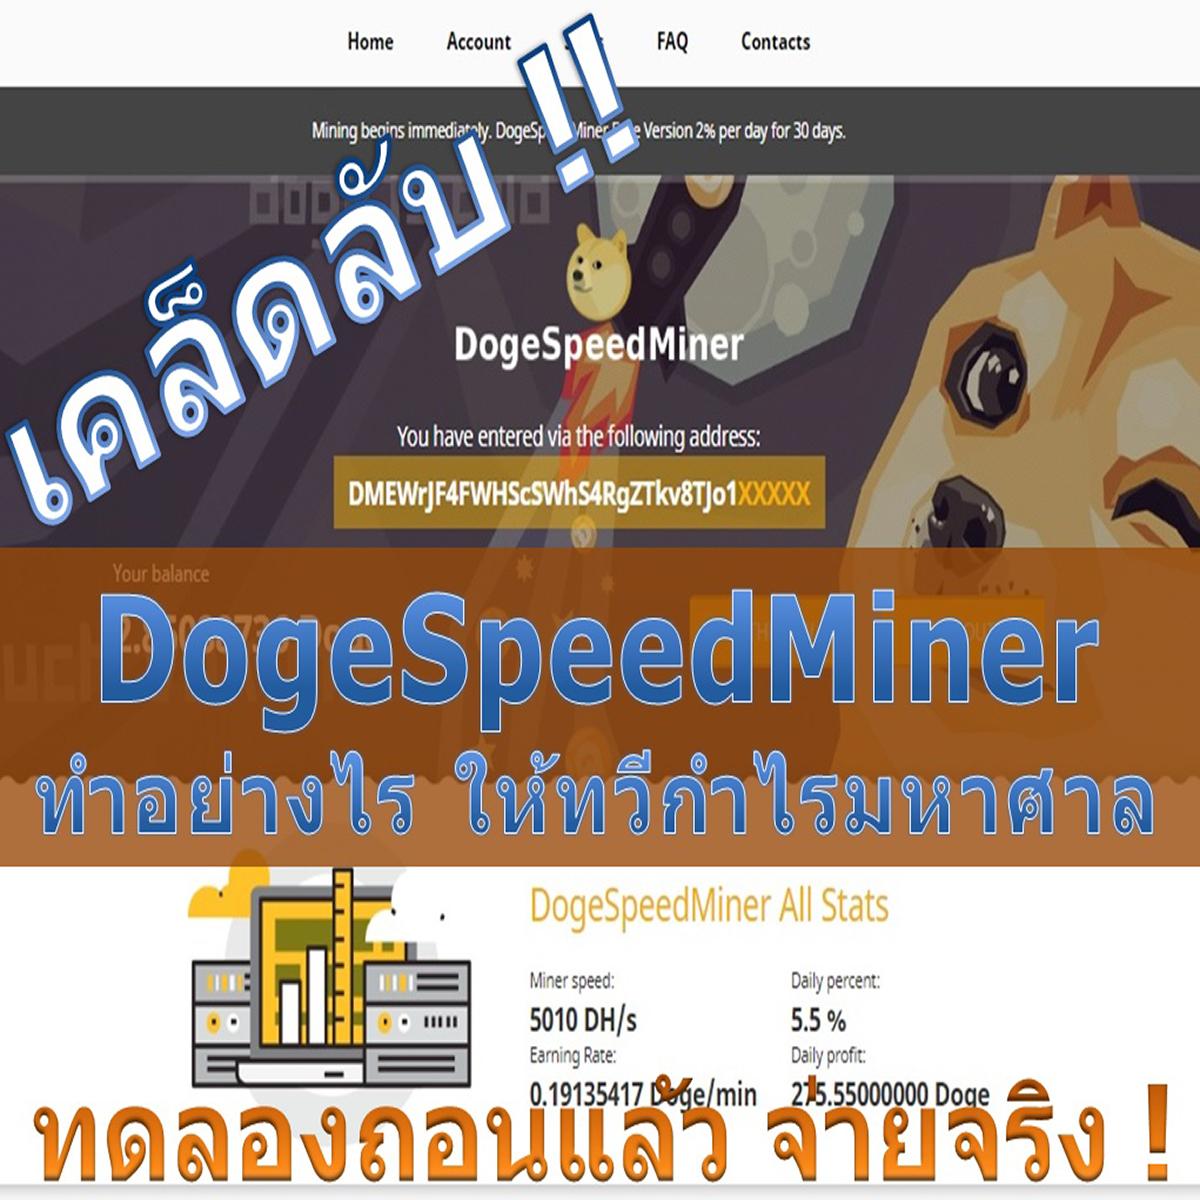 DogeSpeedMiner ทำอย่างไร ให้ทวีกำไรมหาศาล